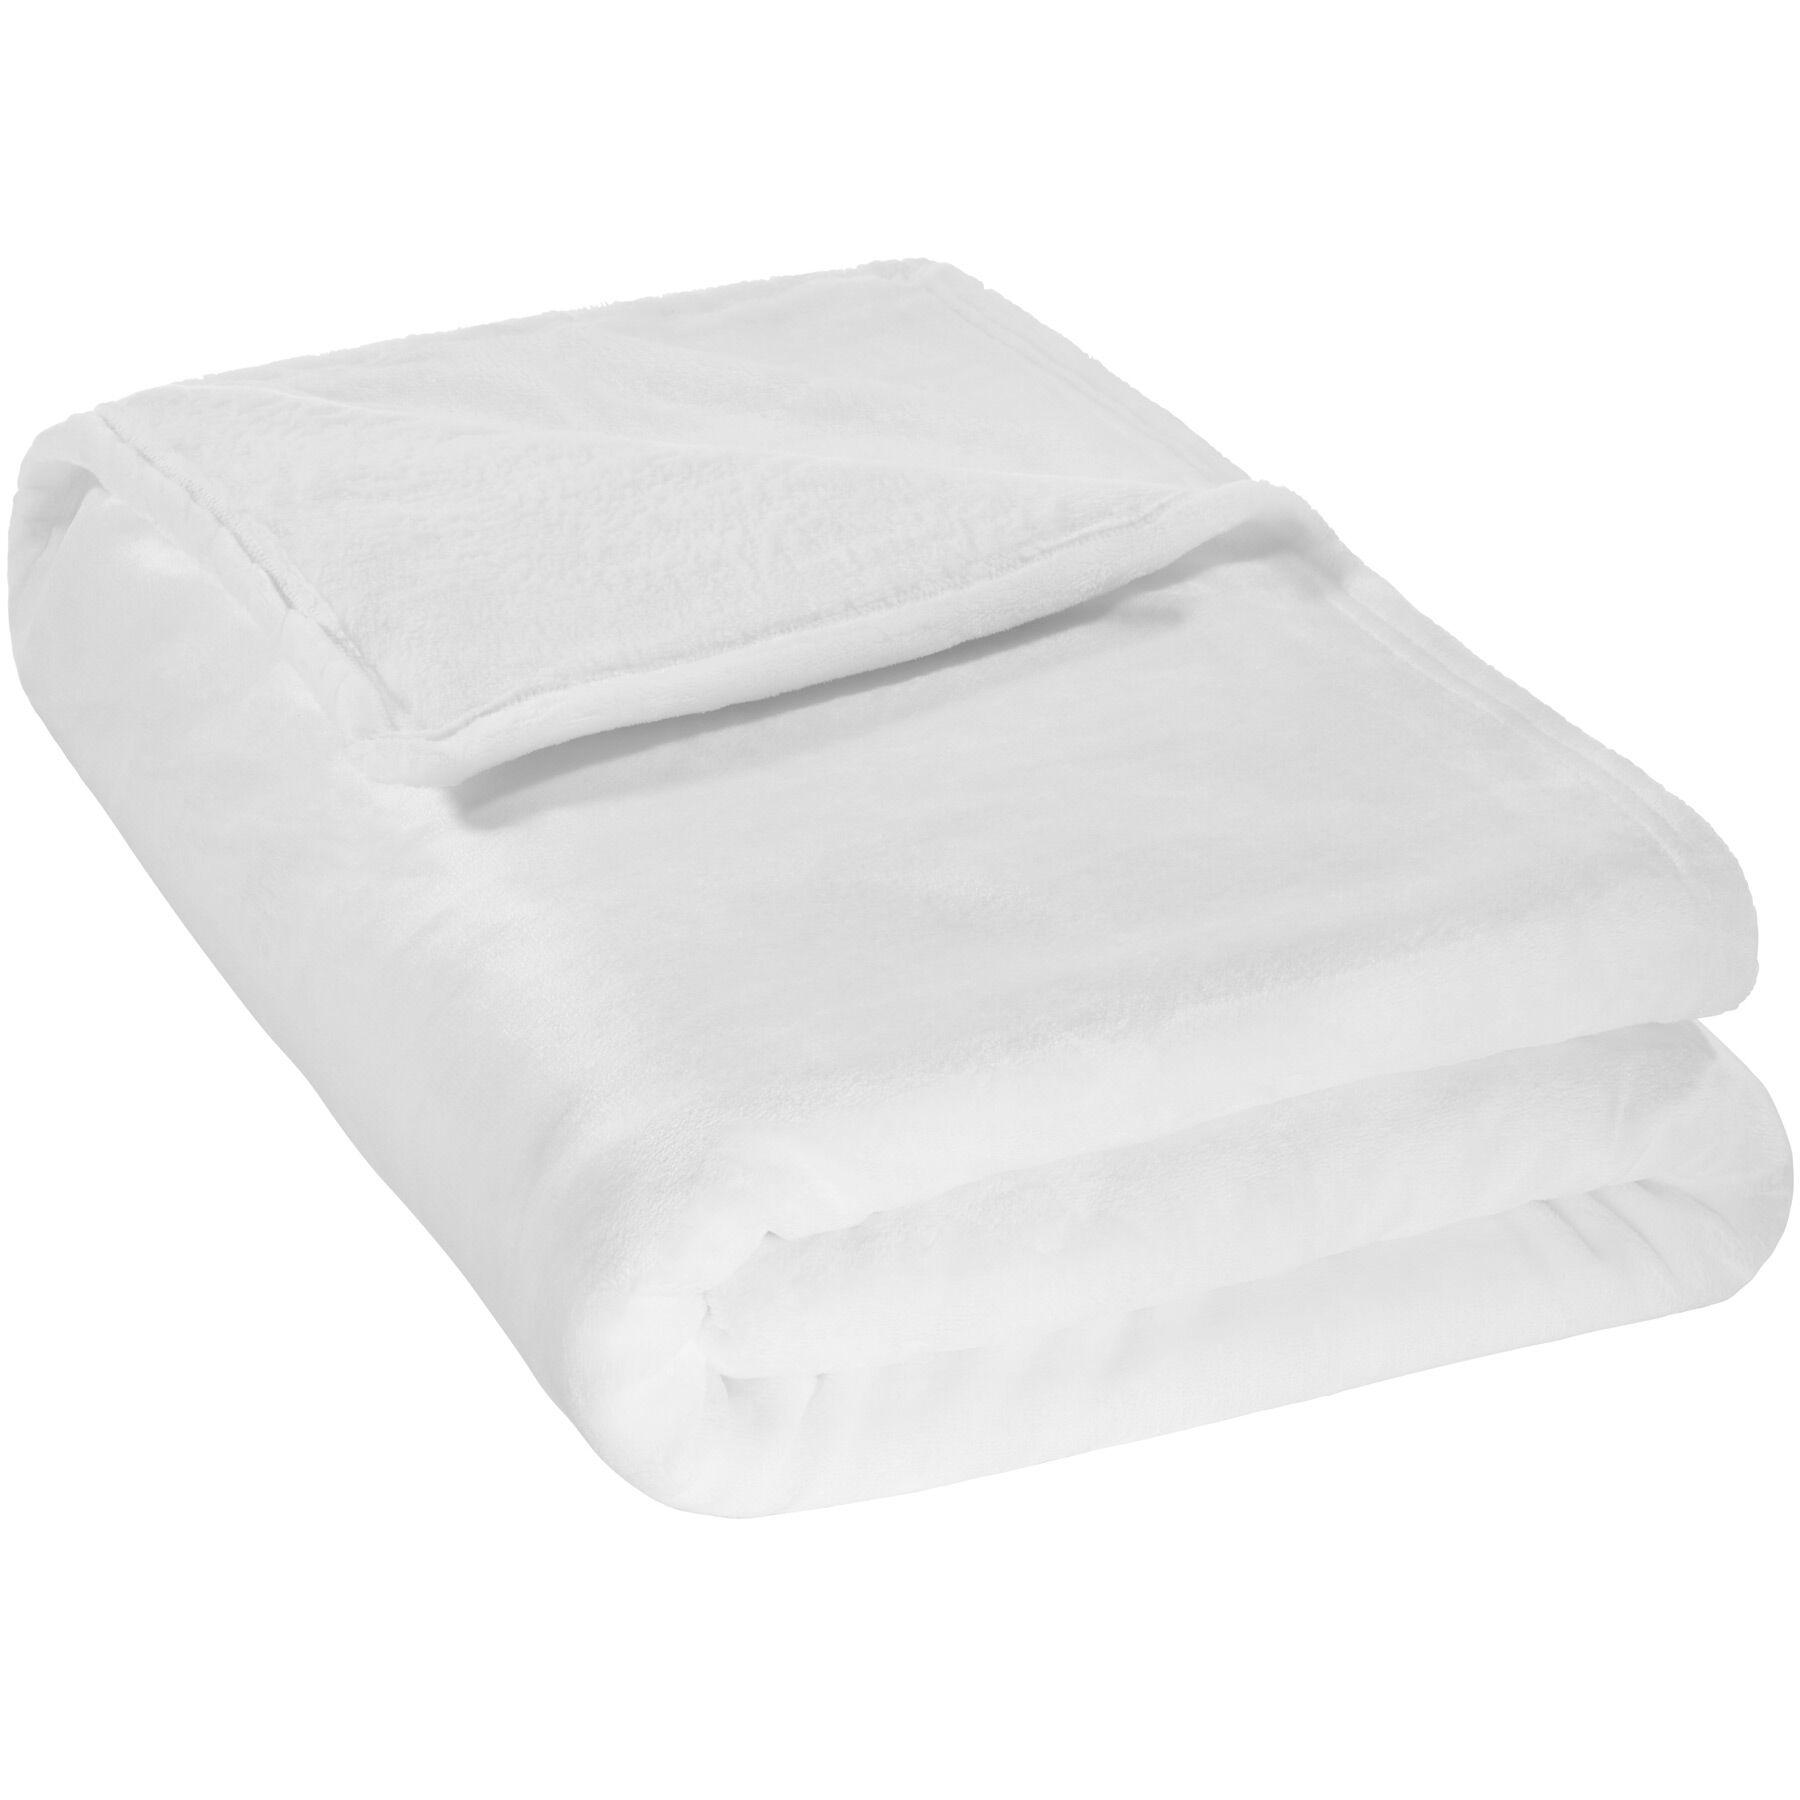 tectake Plaid i polyester - hvid, 220 x 240 cm